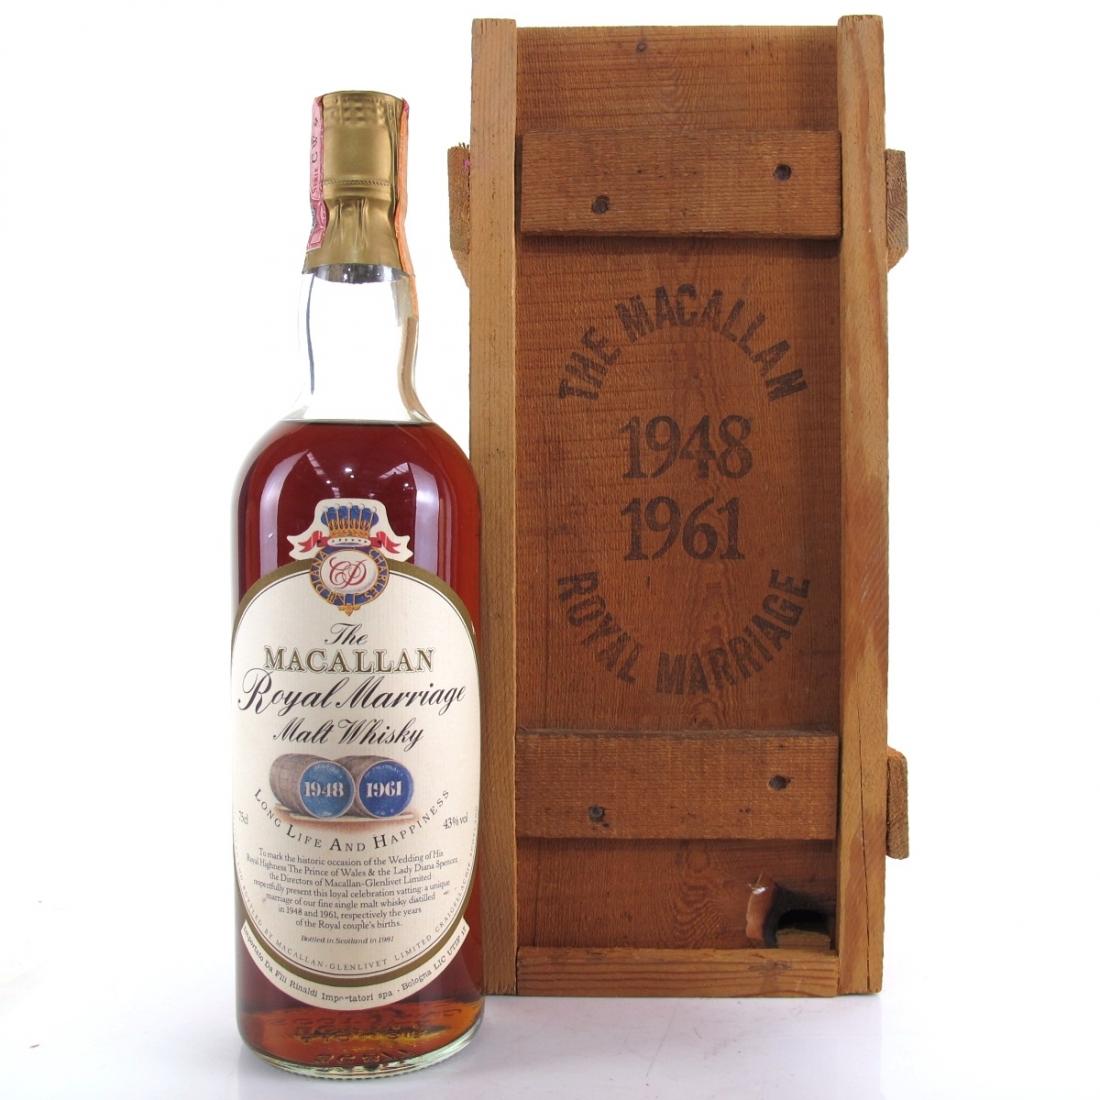 Macallan Royal Marriage 1981 / Rinaldi Import